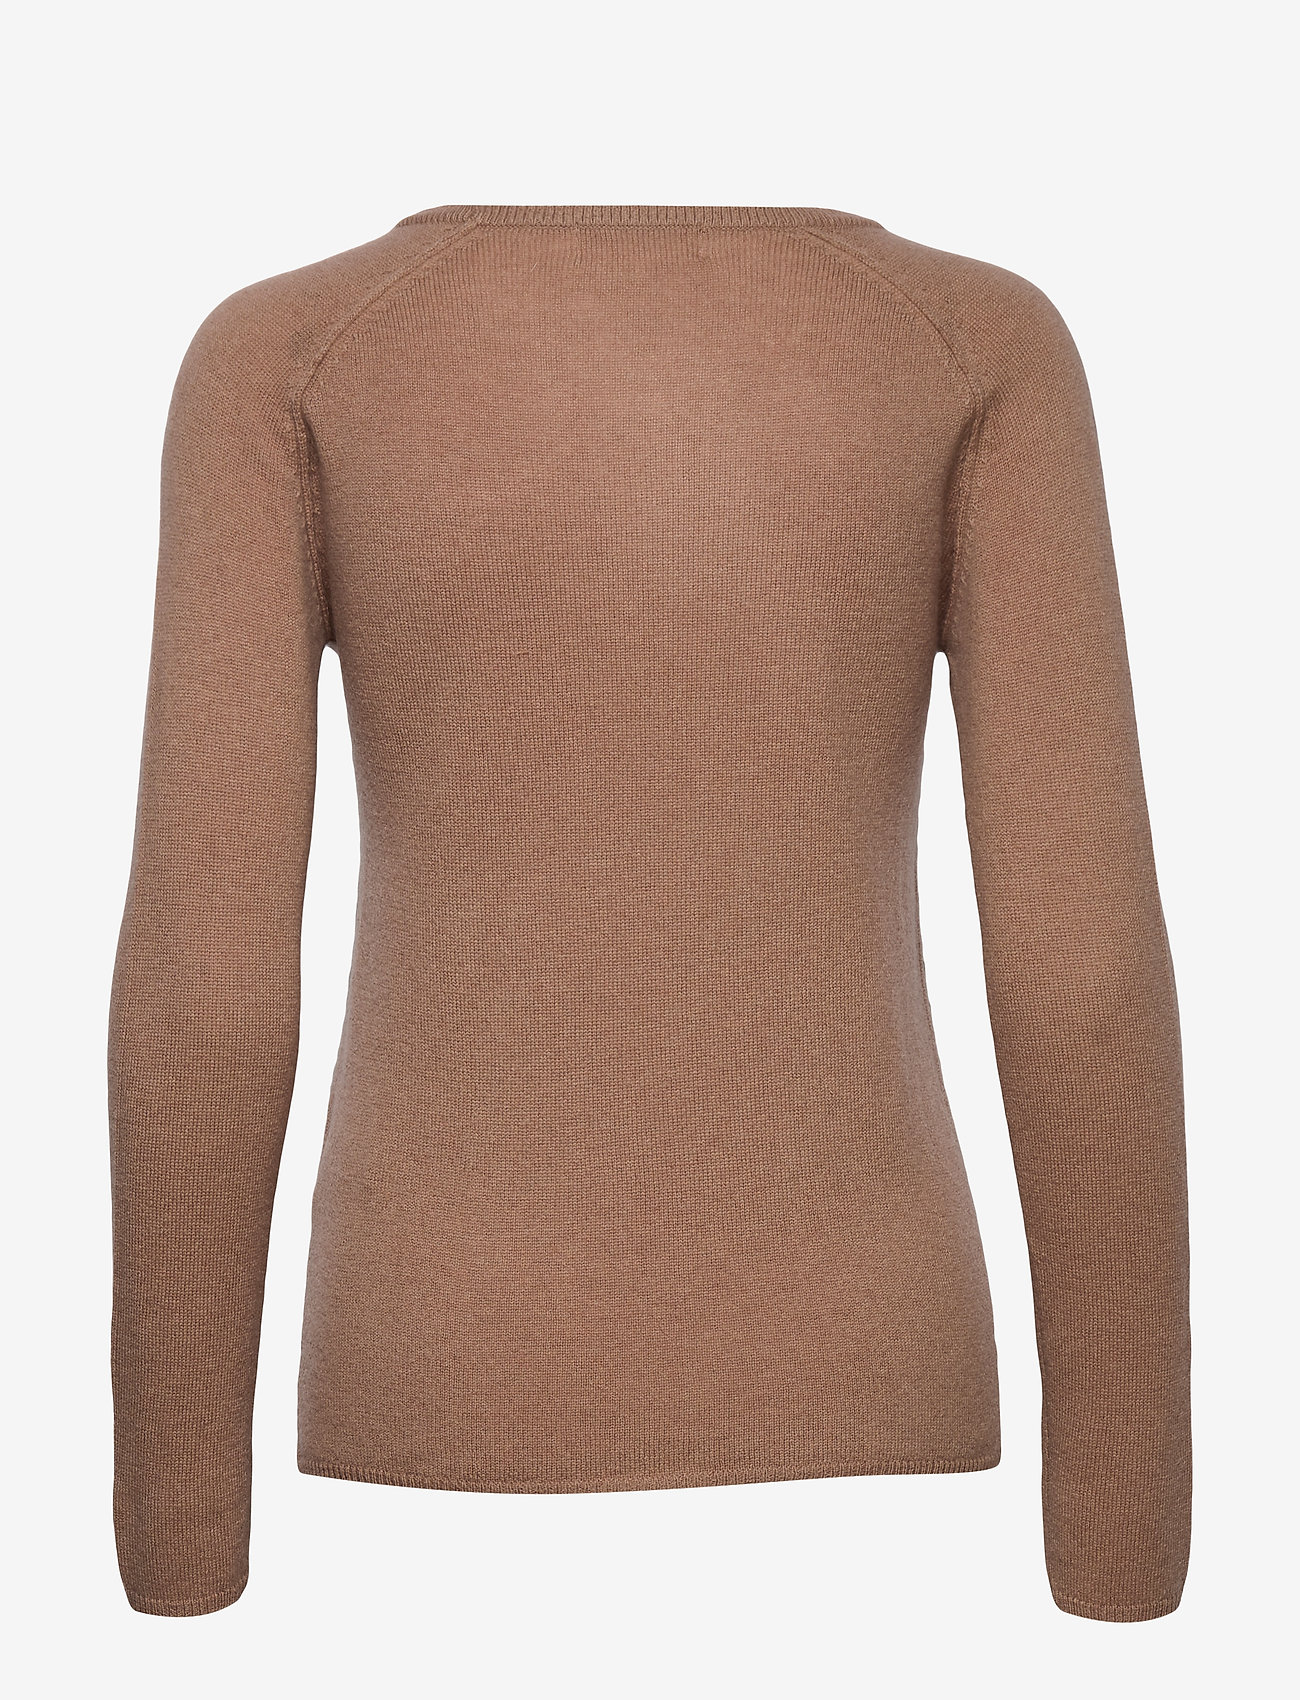 Rosemunde - Wool & cashmere pullover ls - kashmir - nougat brown - 1